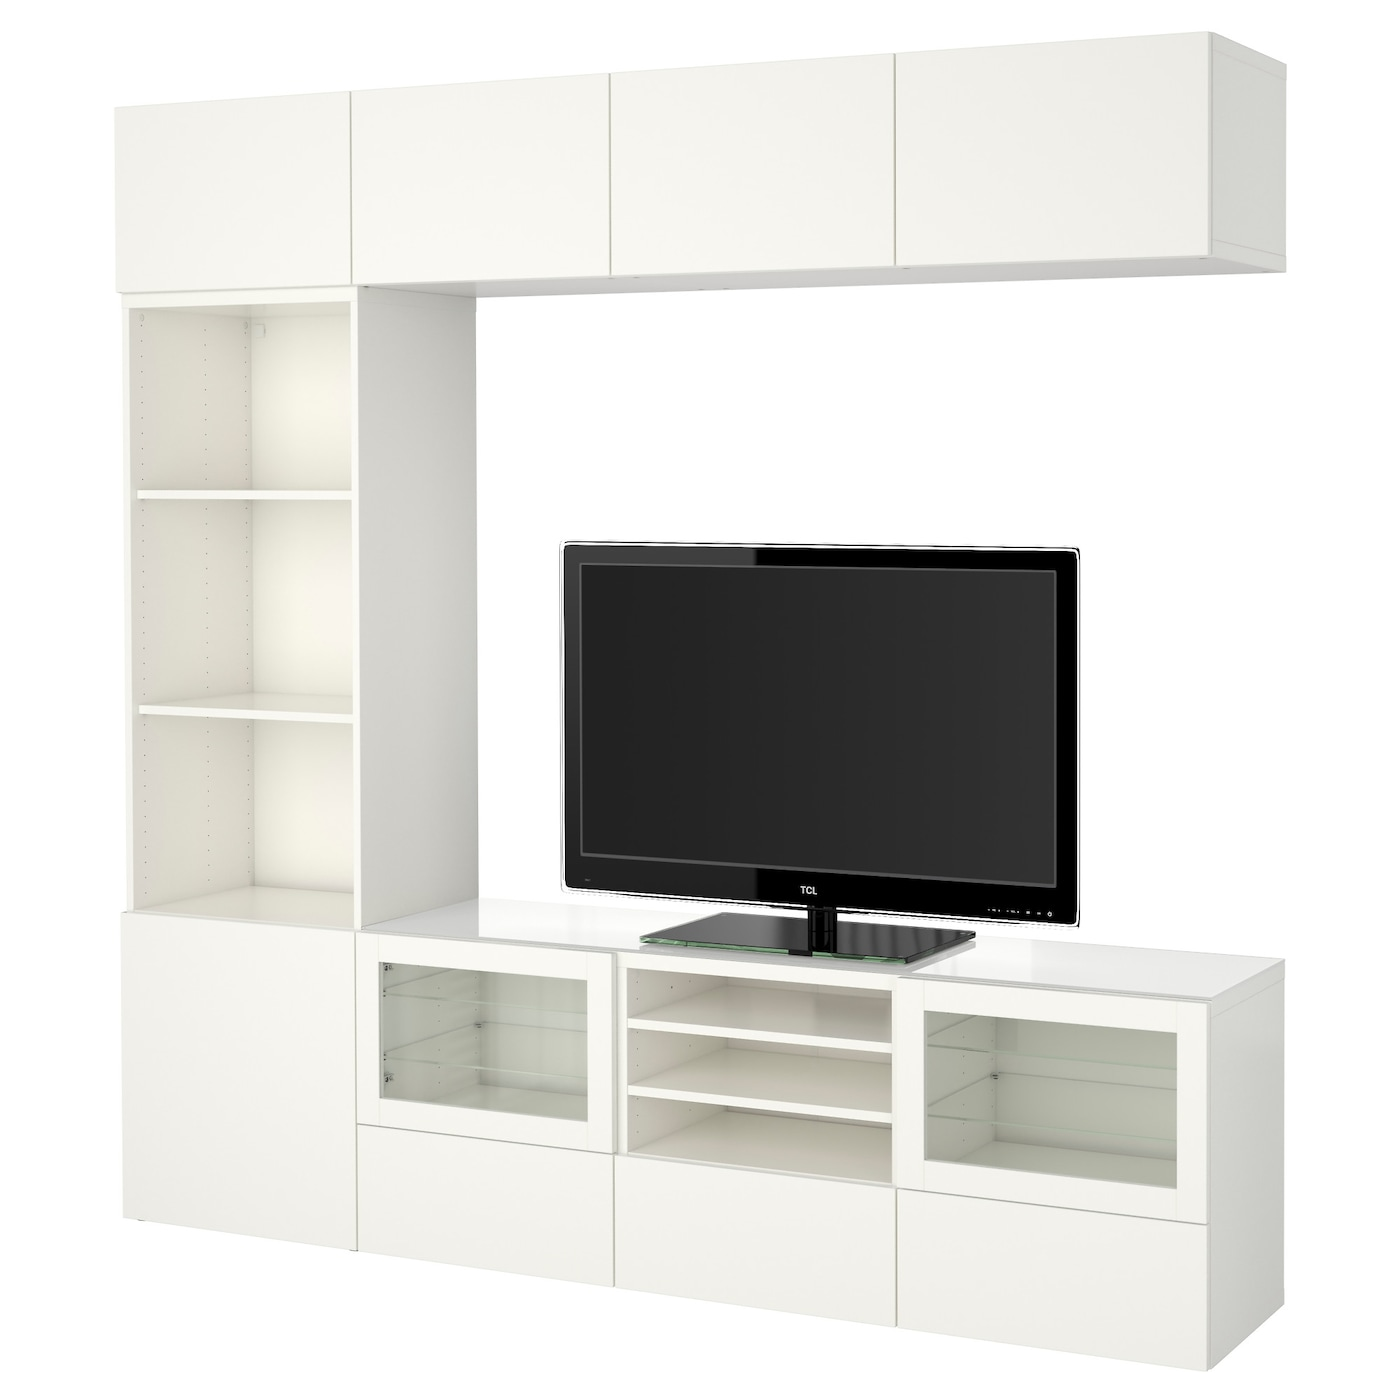 best tv storage combination glass doors lappviken sindvik white clear glass 240x40x230 cm ikea. Black Bedroom Furniture Sets. Home Design Ideas